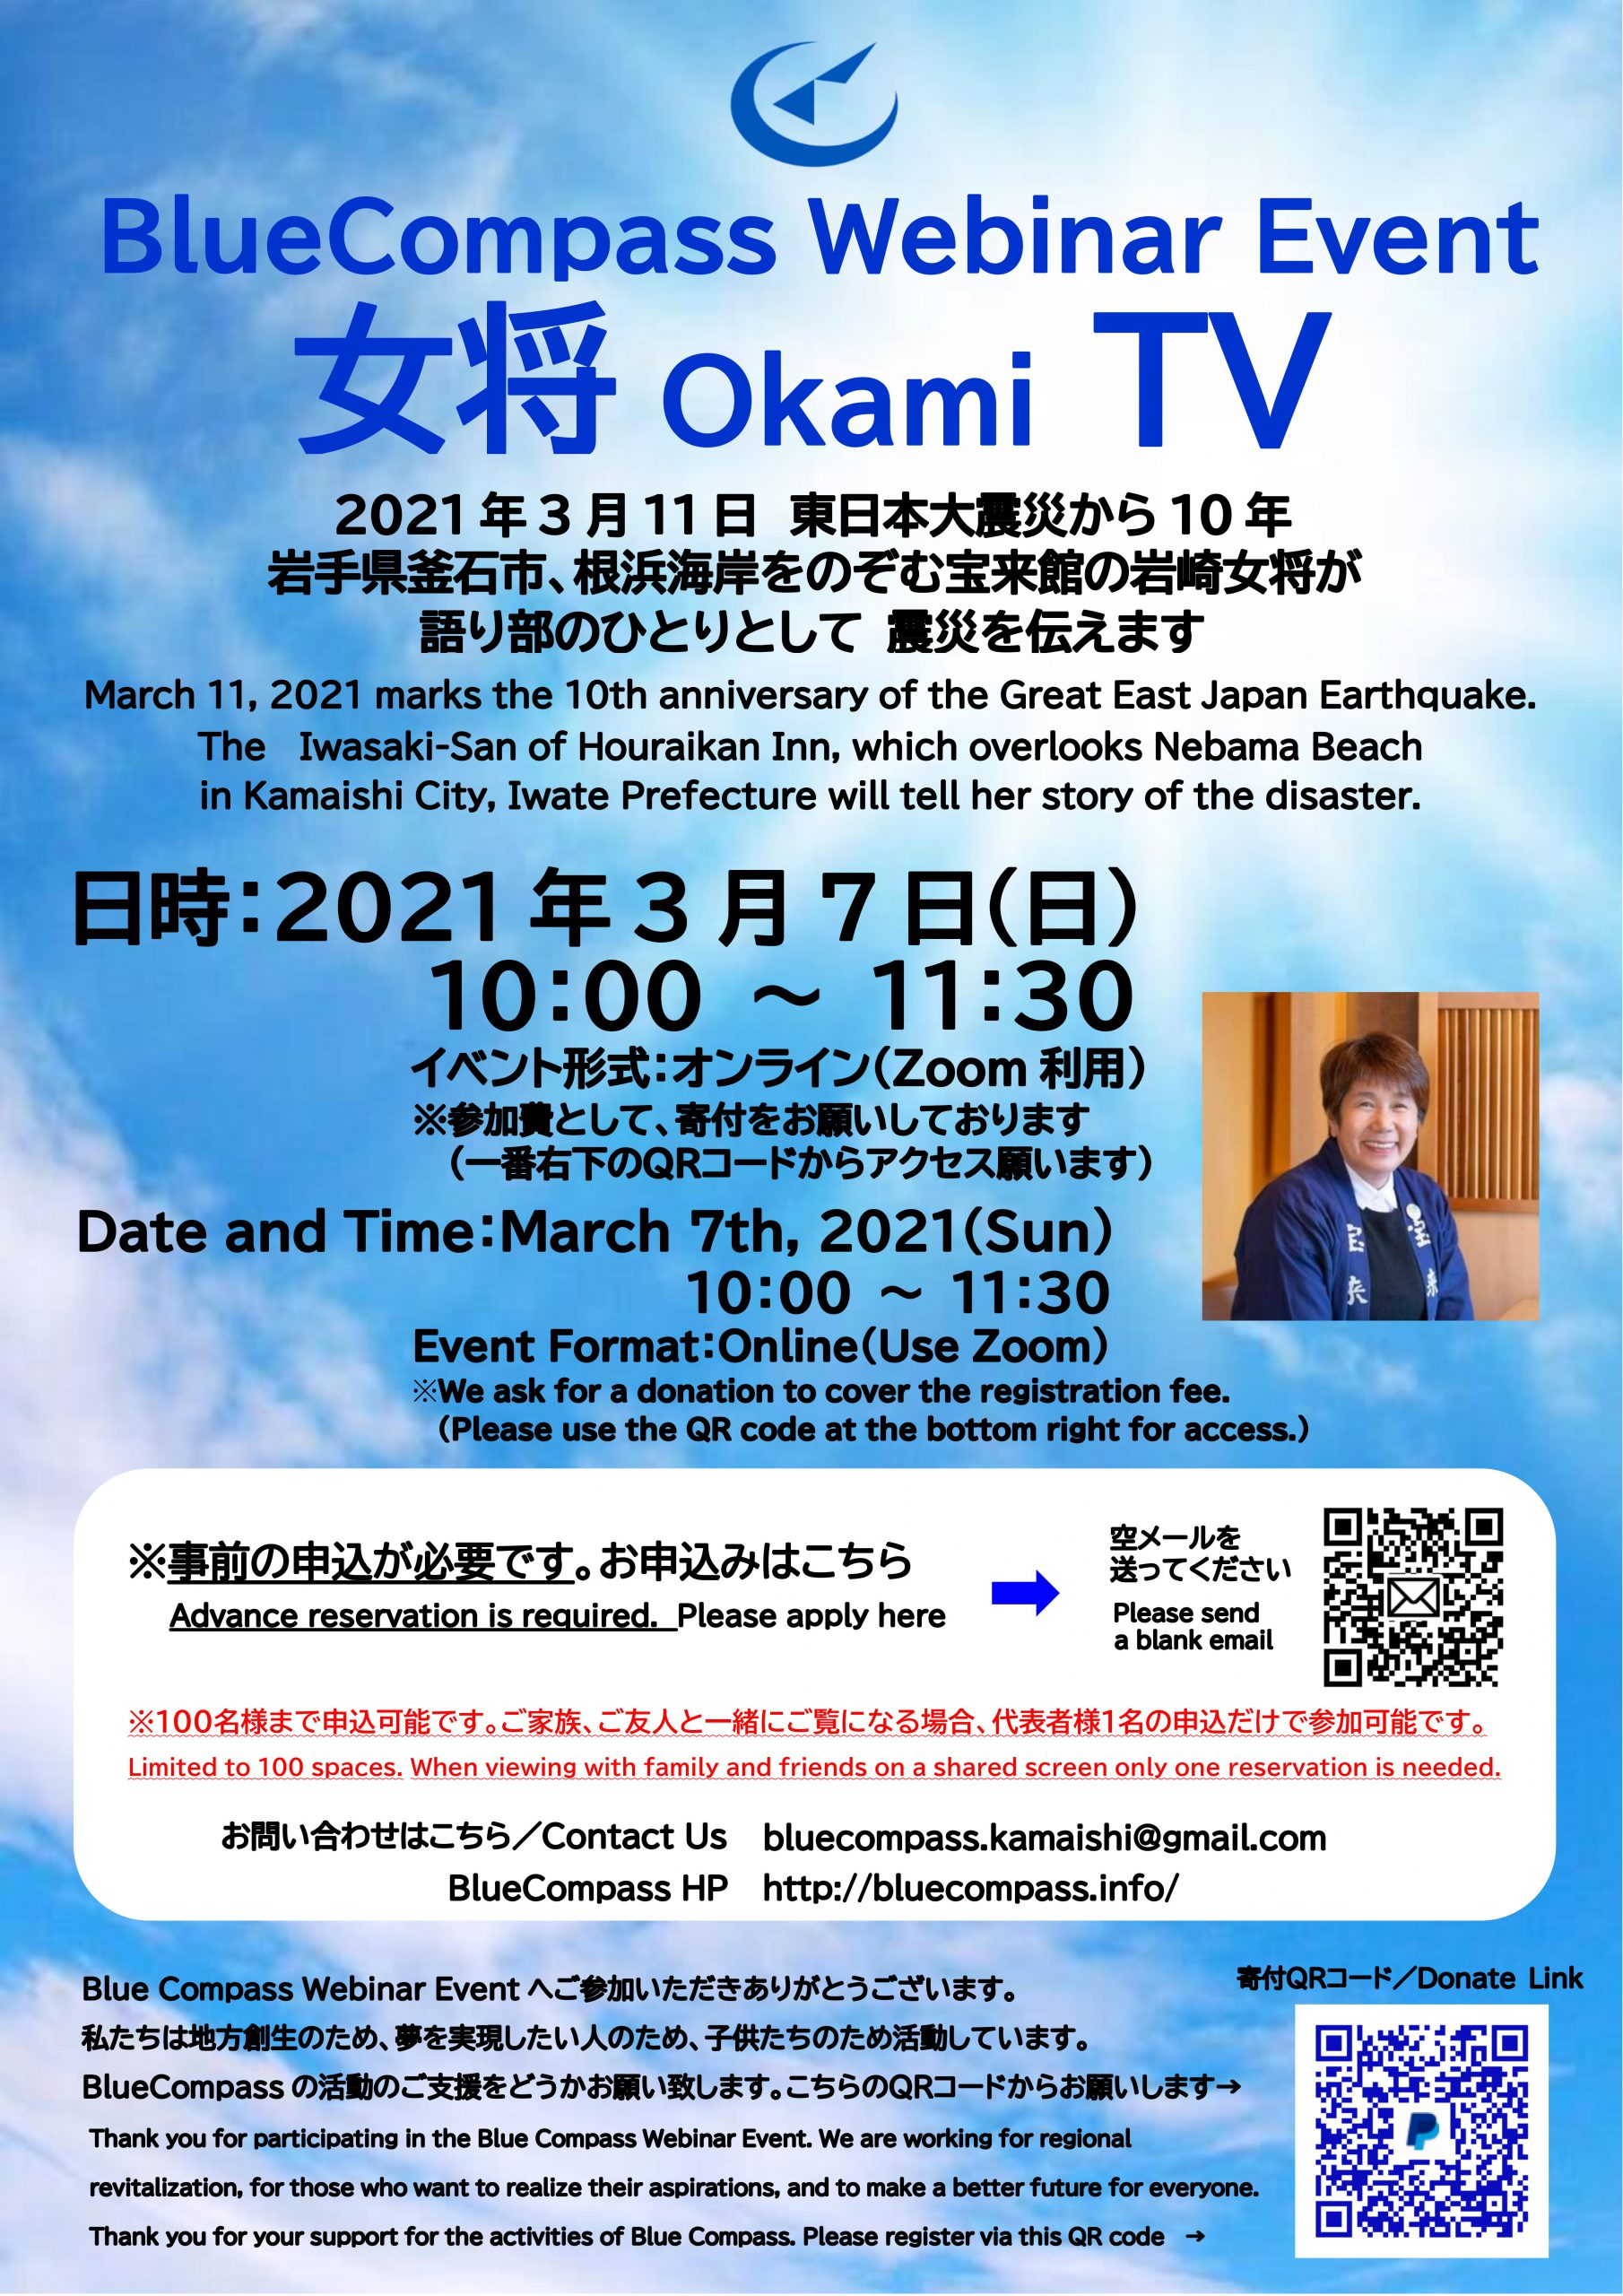 BC Webinar Event/ BCウェビナーイベント